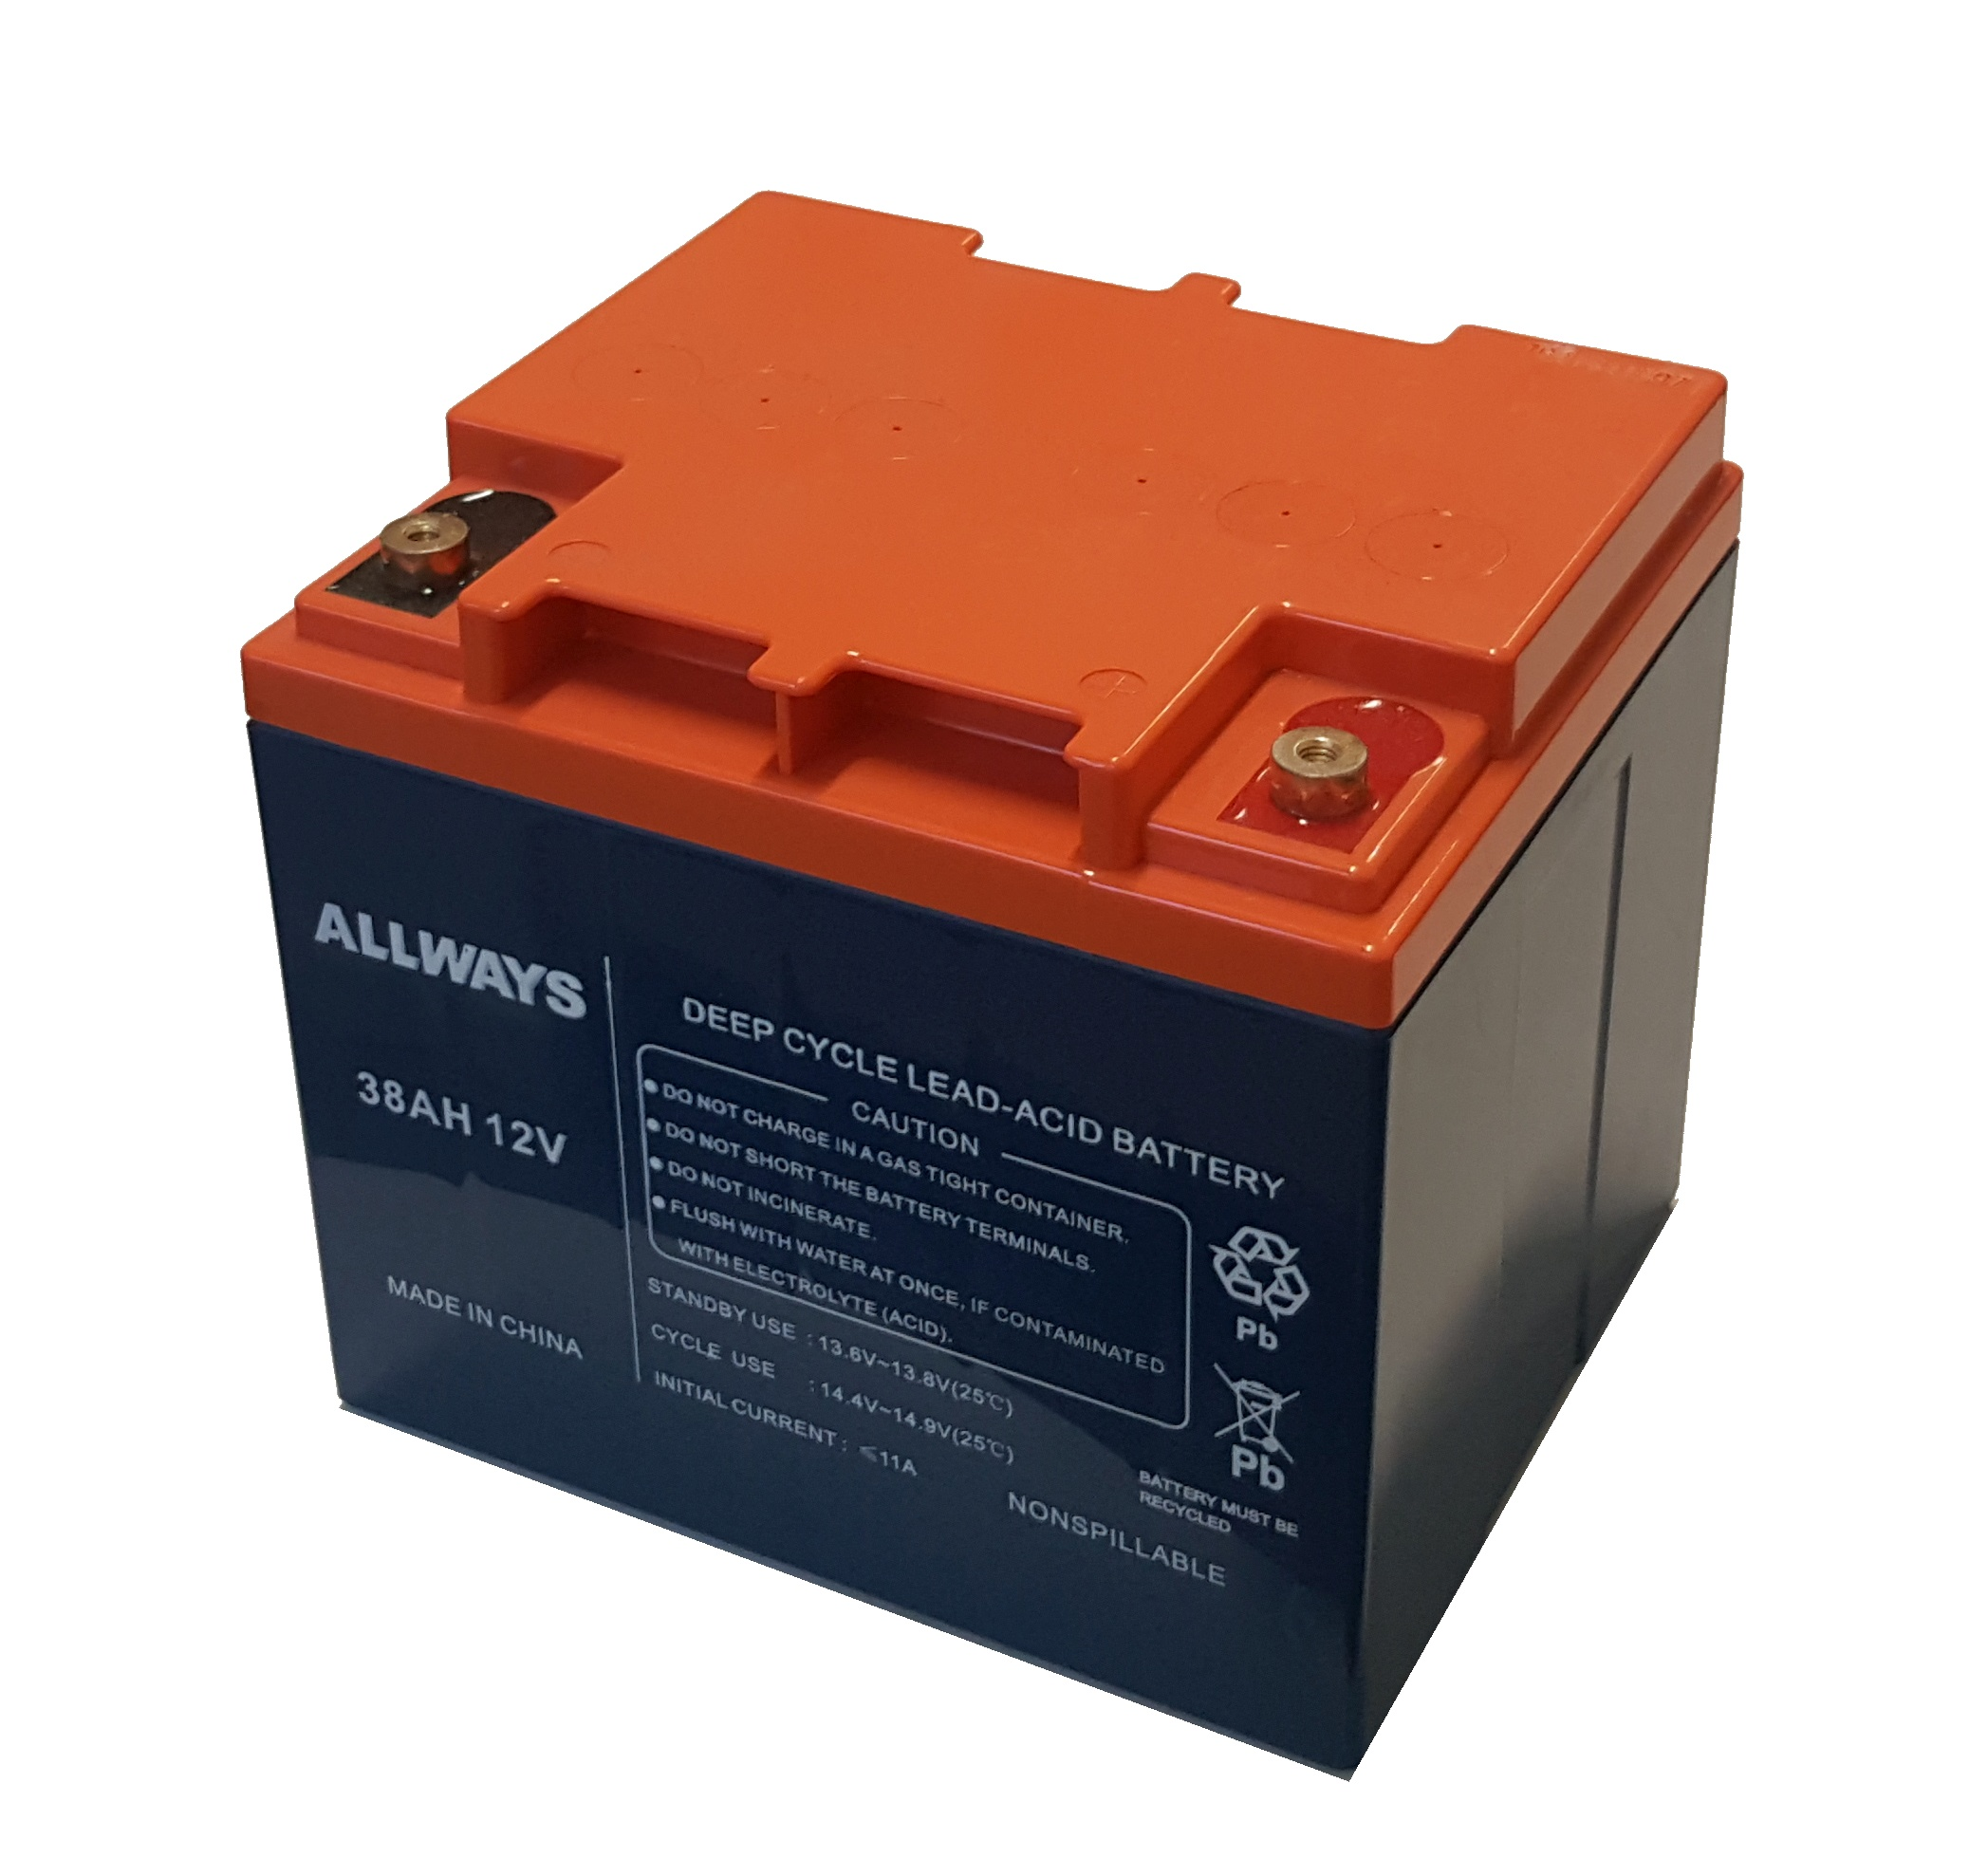 Batteria al piombo ricaricabile 38ah 12 volt